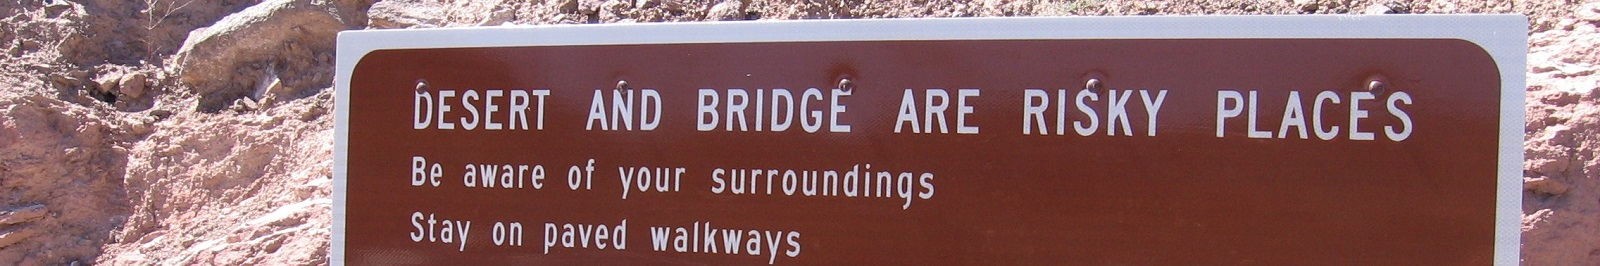 Desert and Bridge are Risky Places